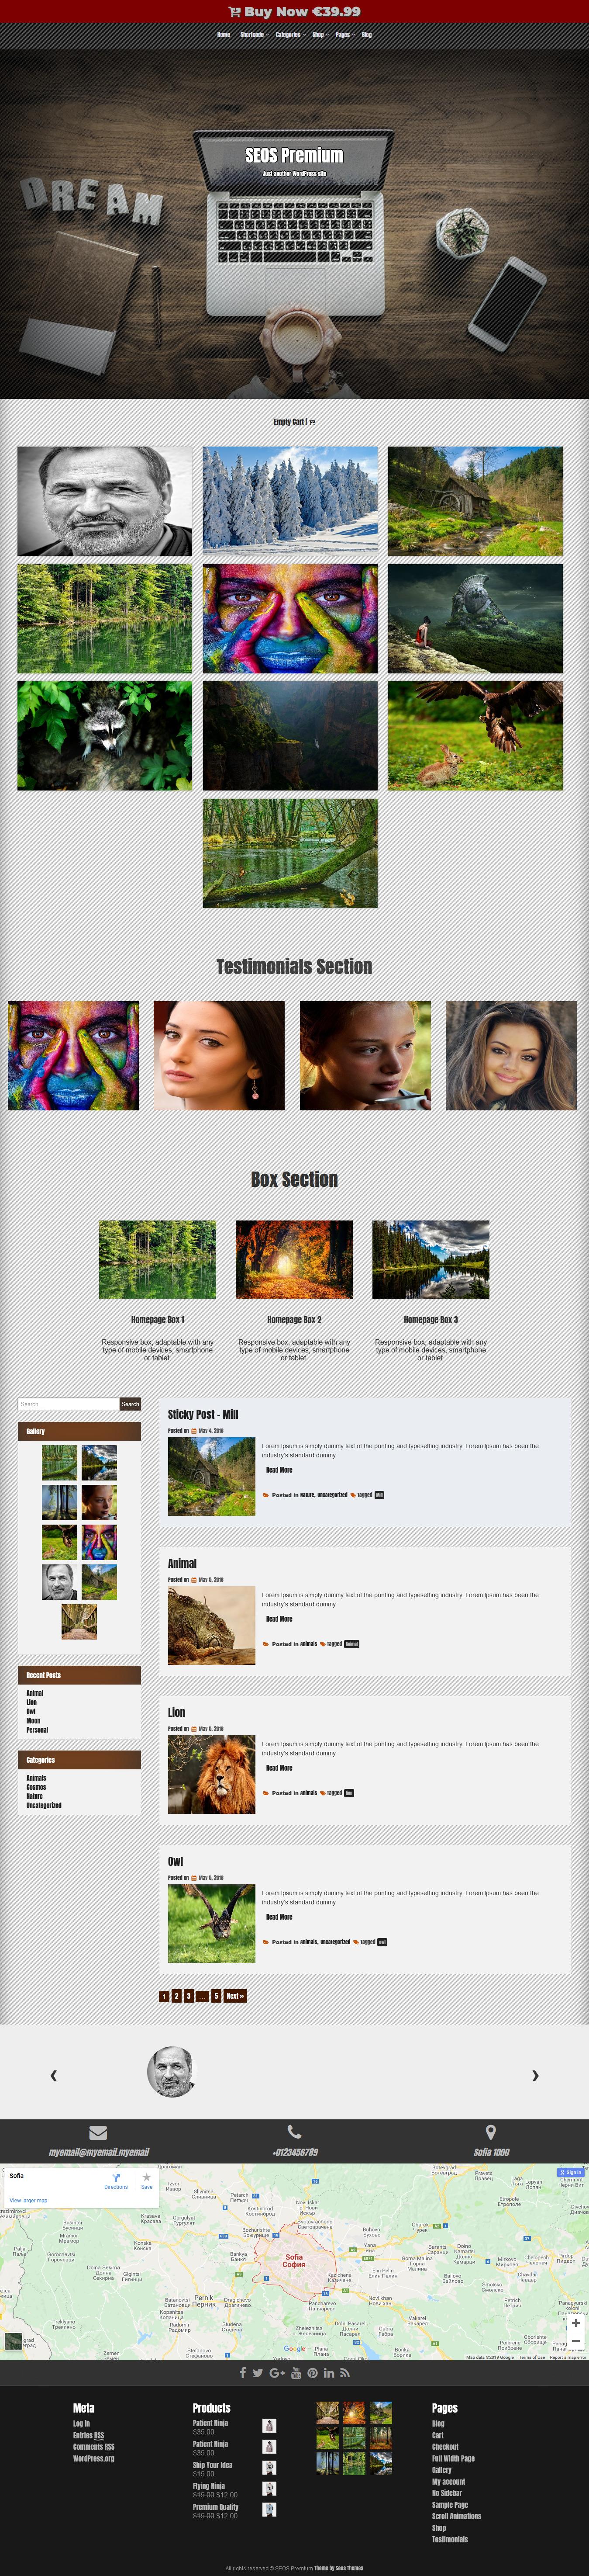 SEOS - Mejor tema WordPress gratuito para agencias de SEO